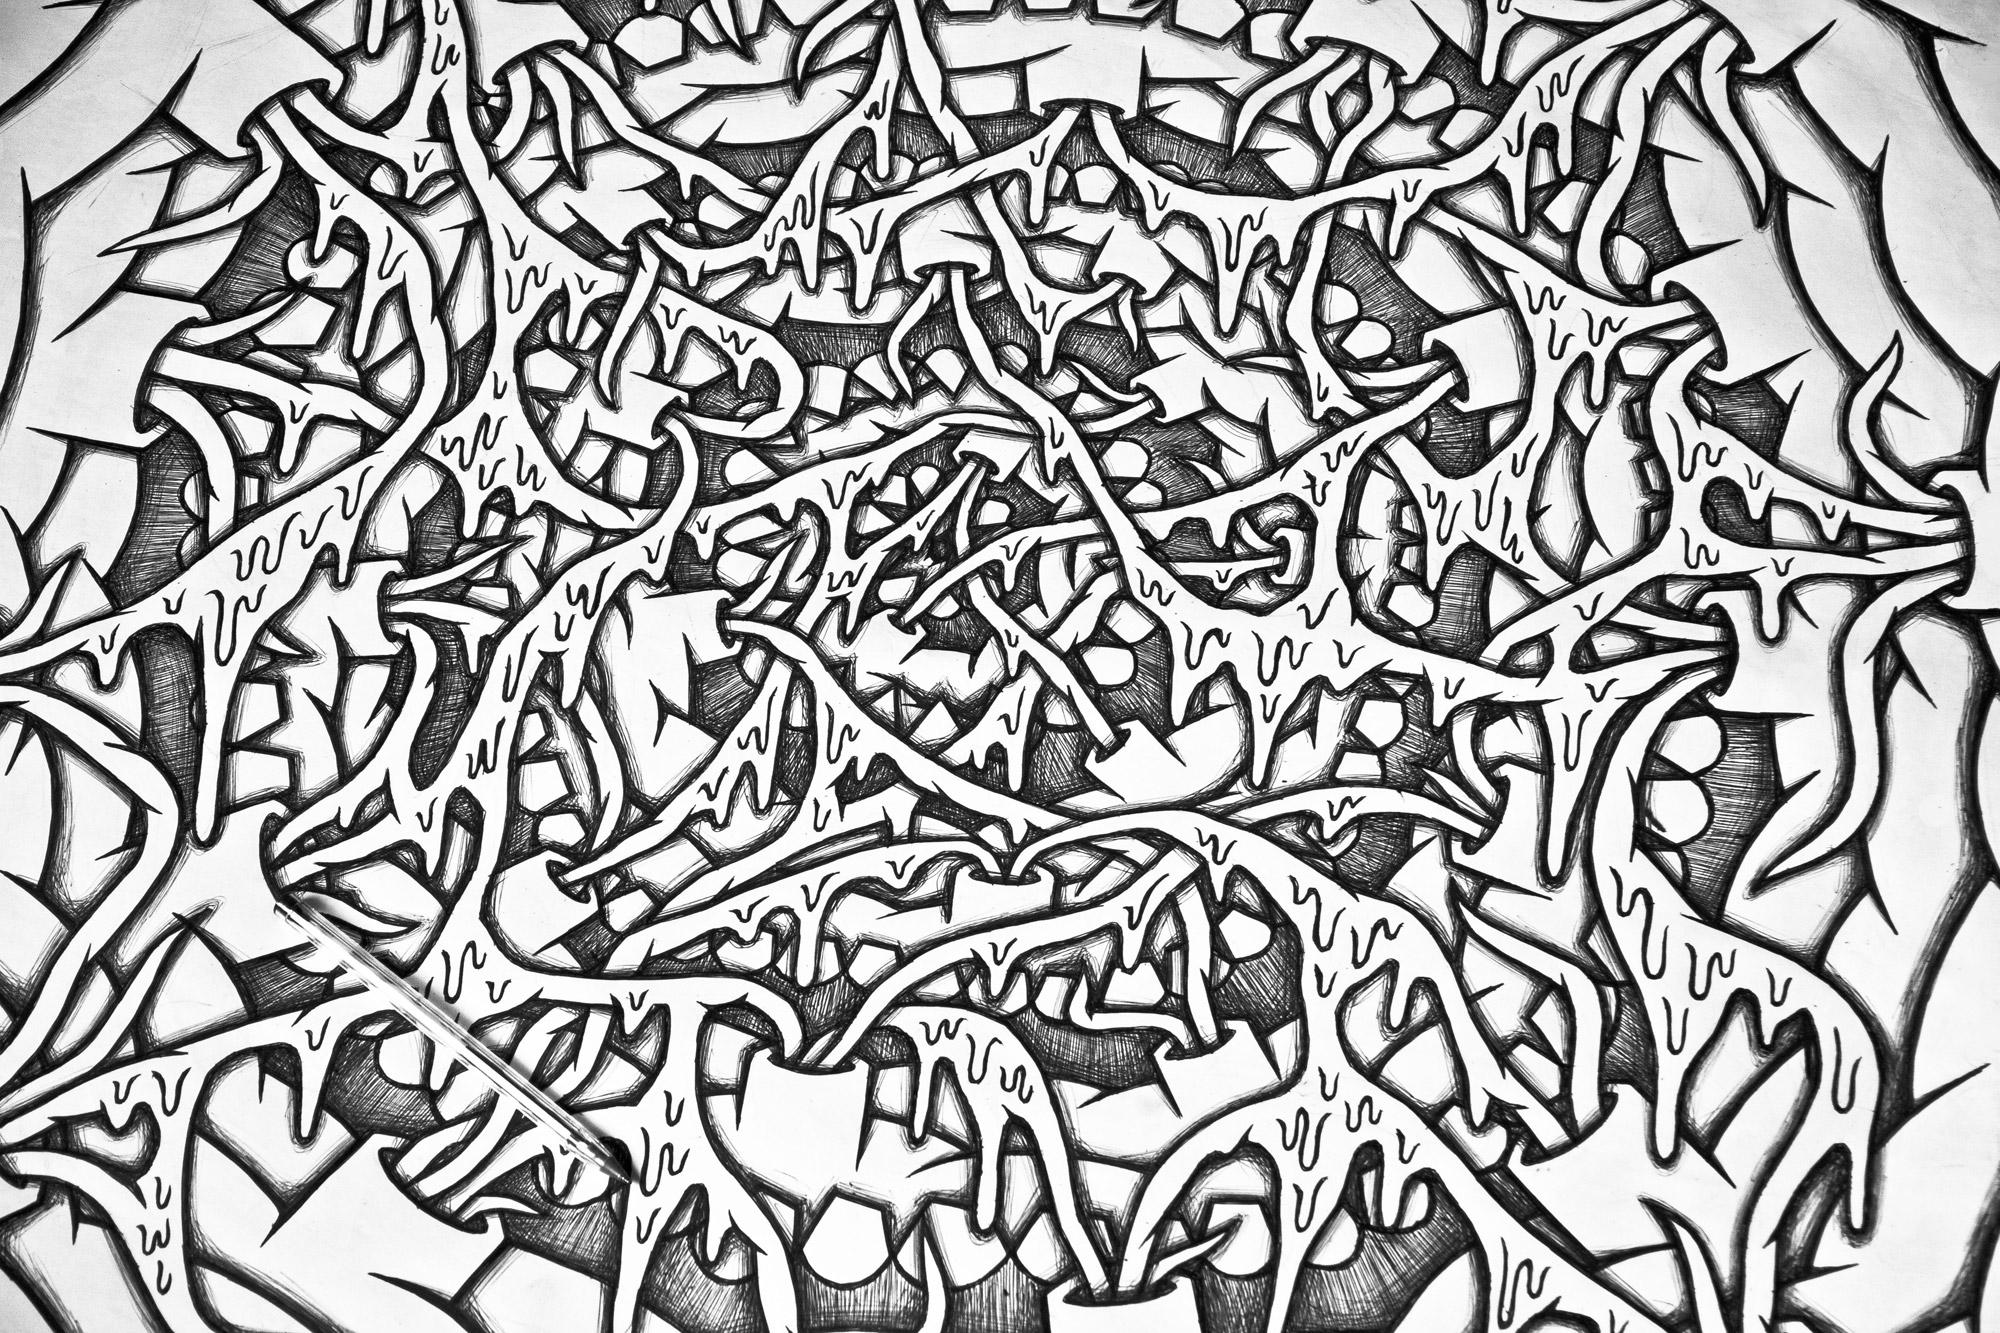 mandala-intero-mouth-detail1